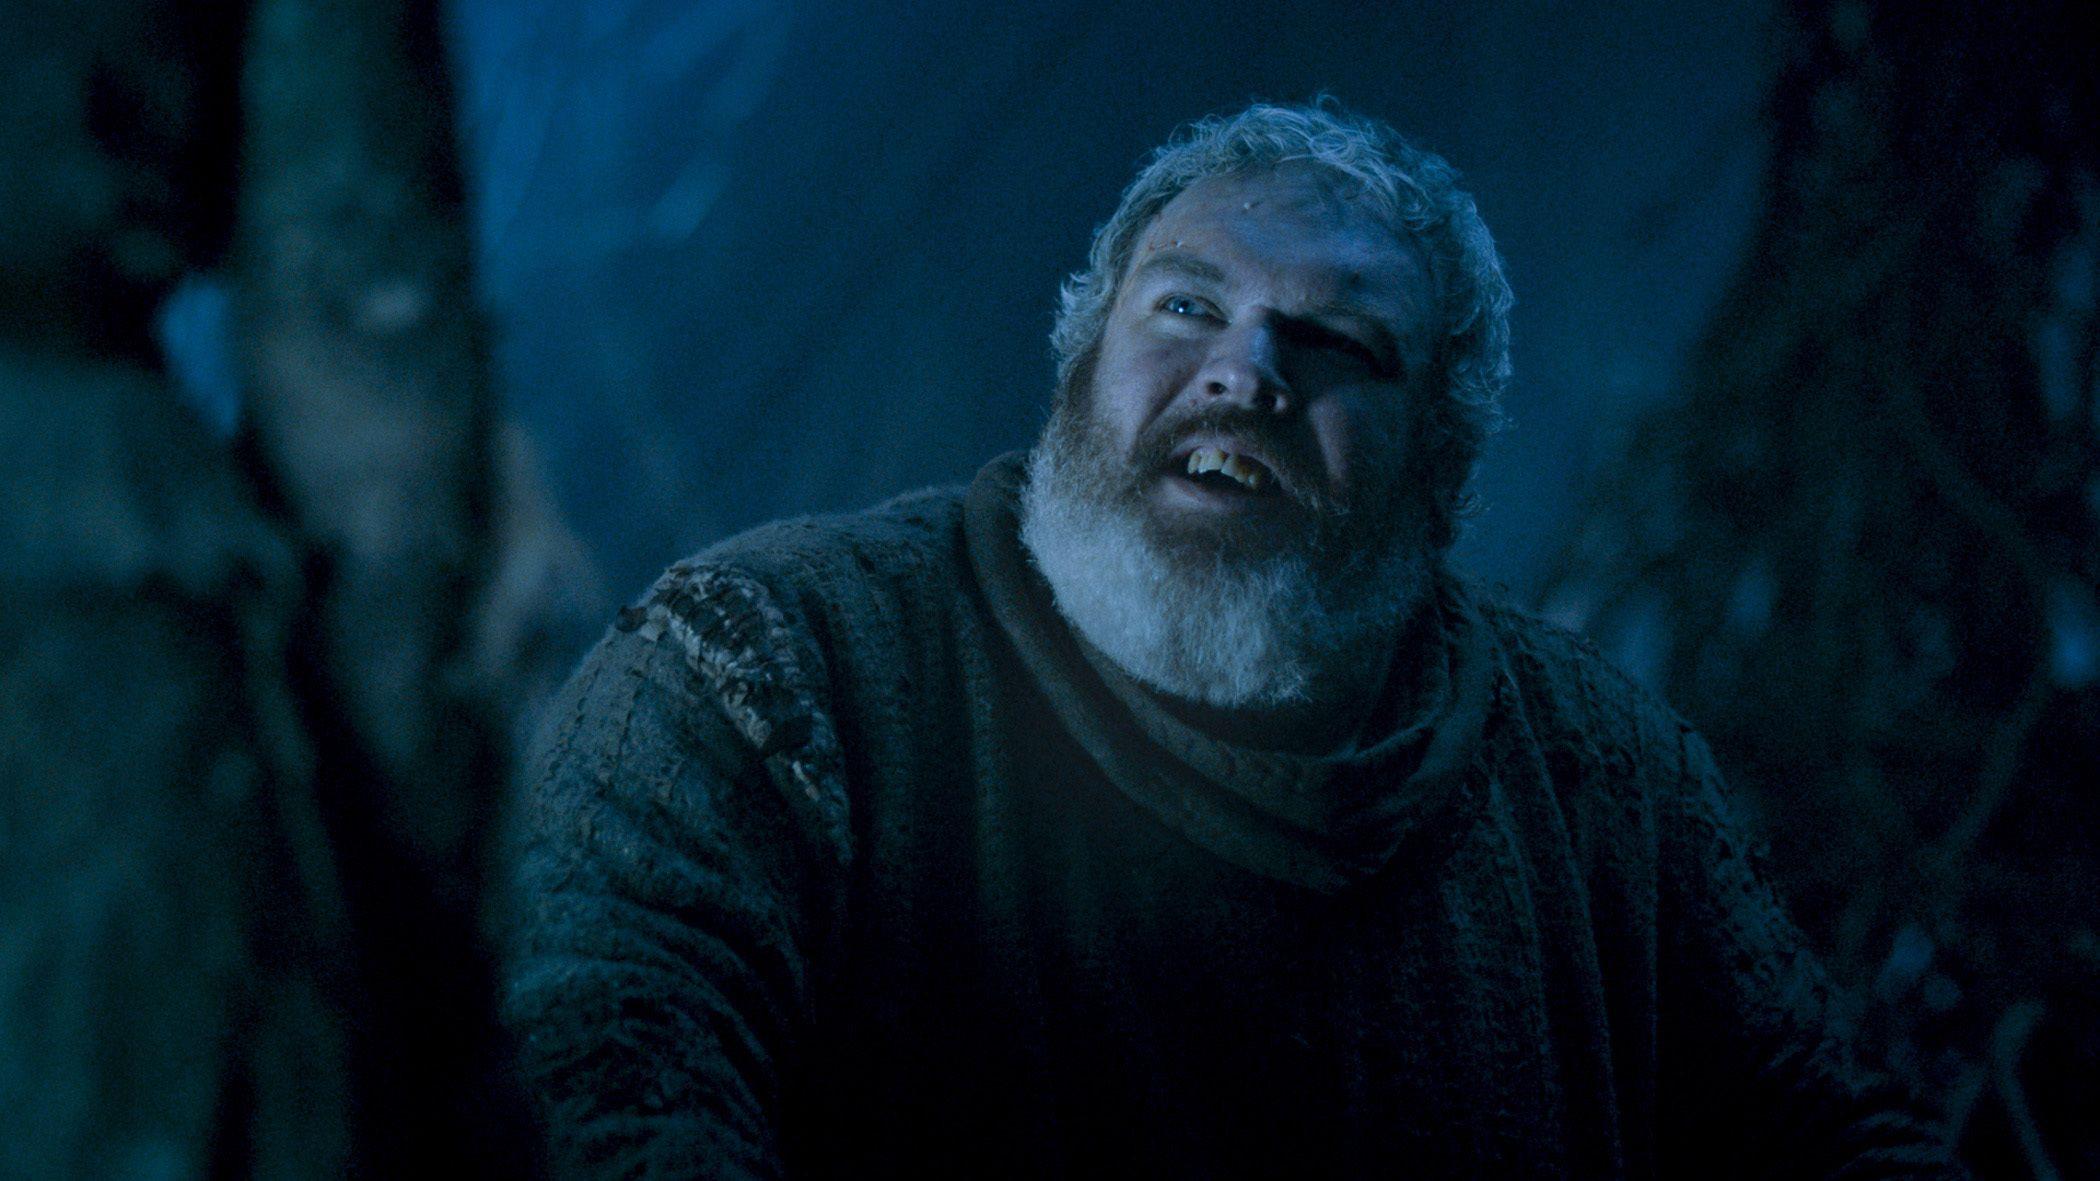 Game of Thrones' Hodor